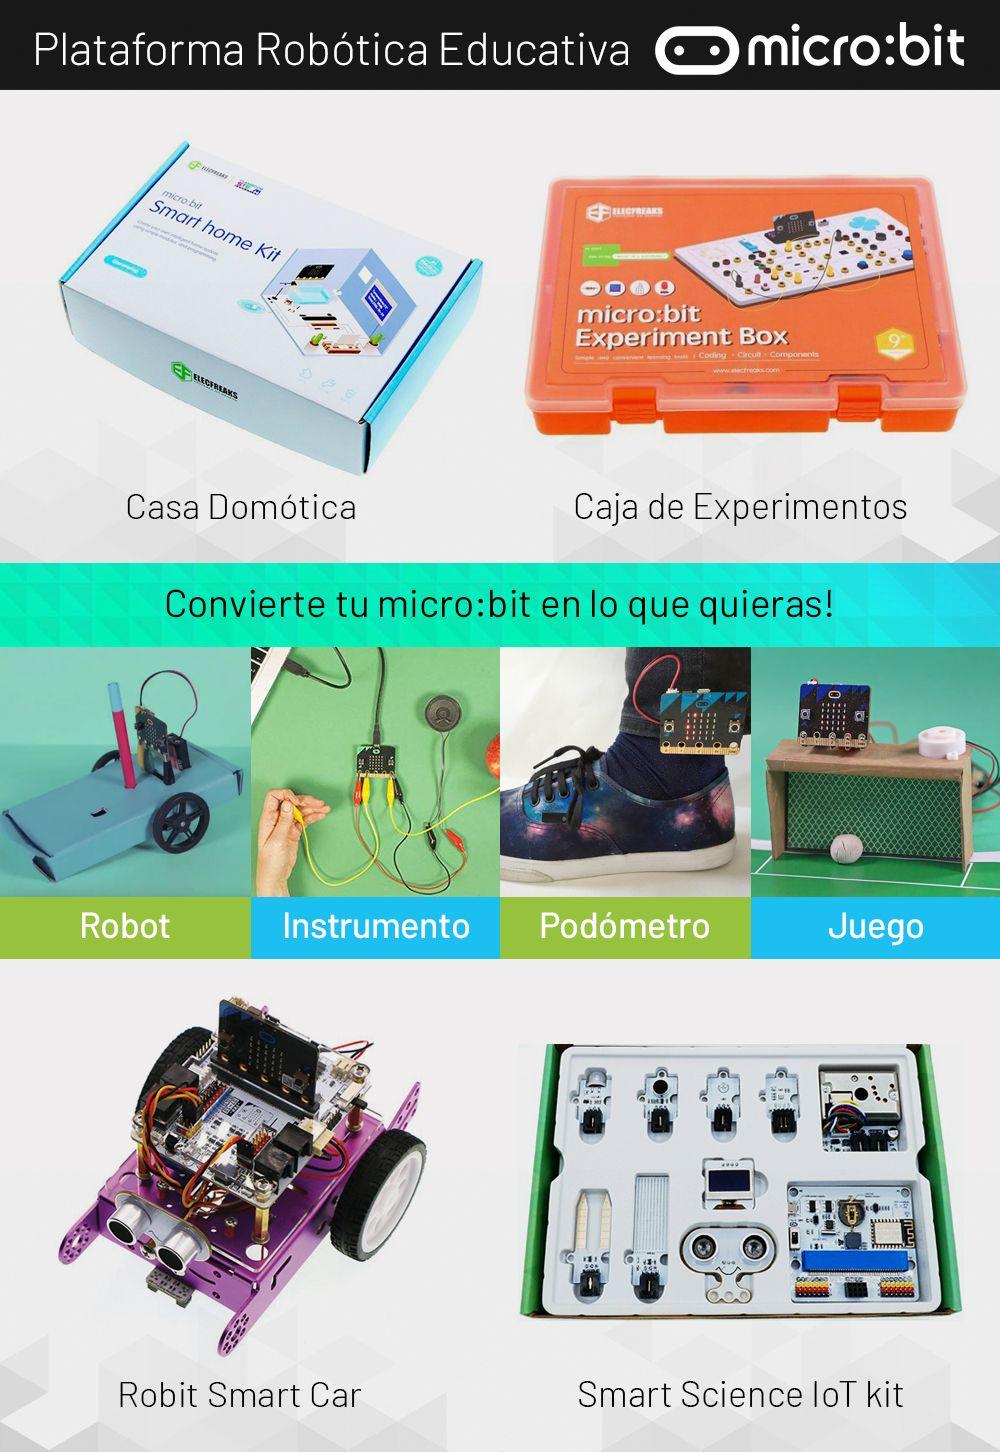 La tarjeta micro:bit se consolida como plataforma educativa STEAM